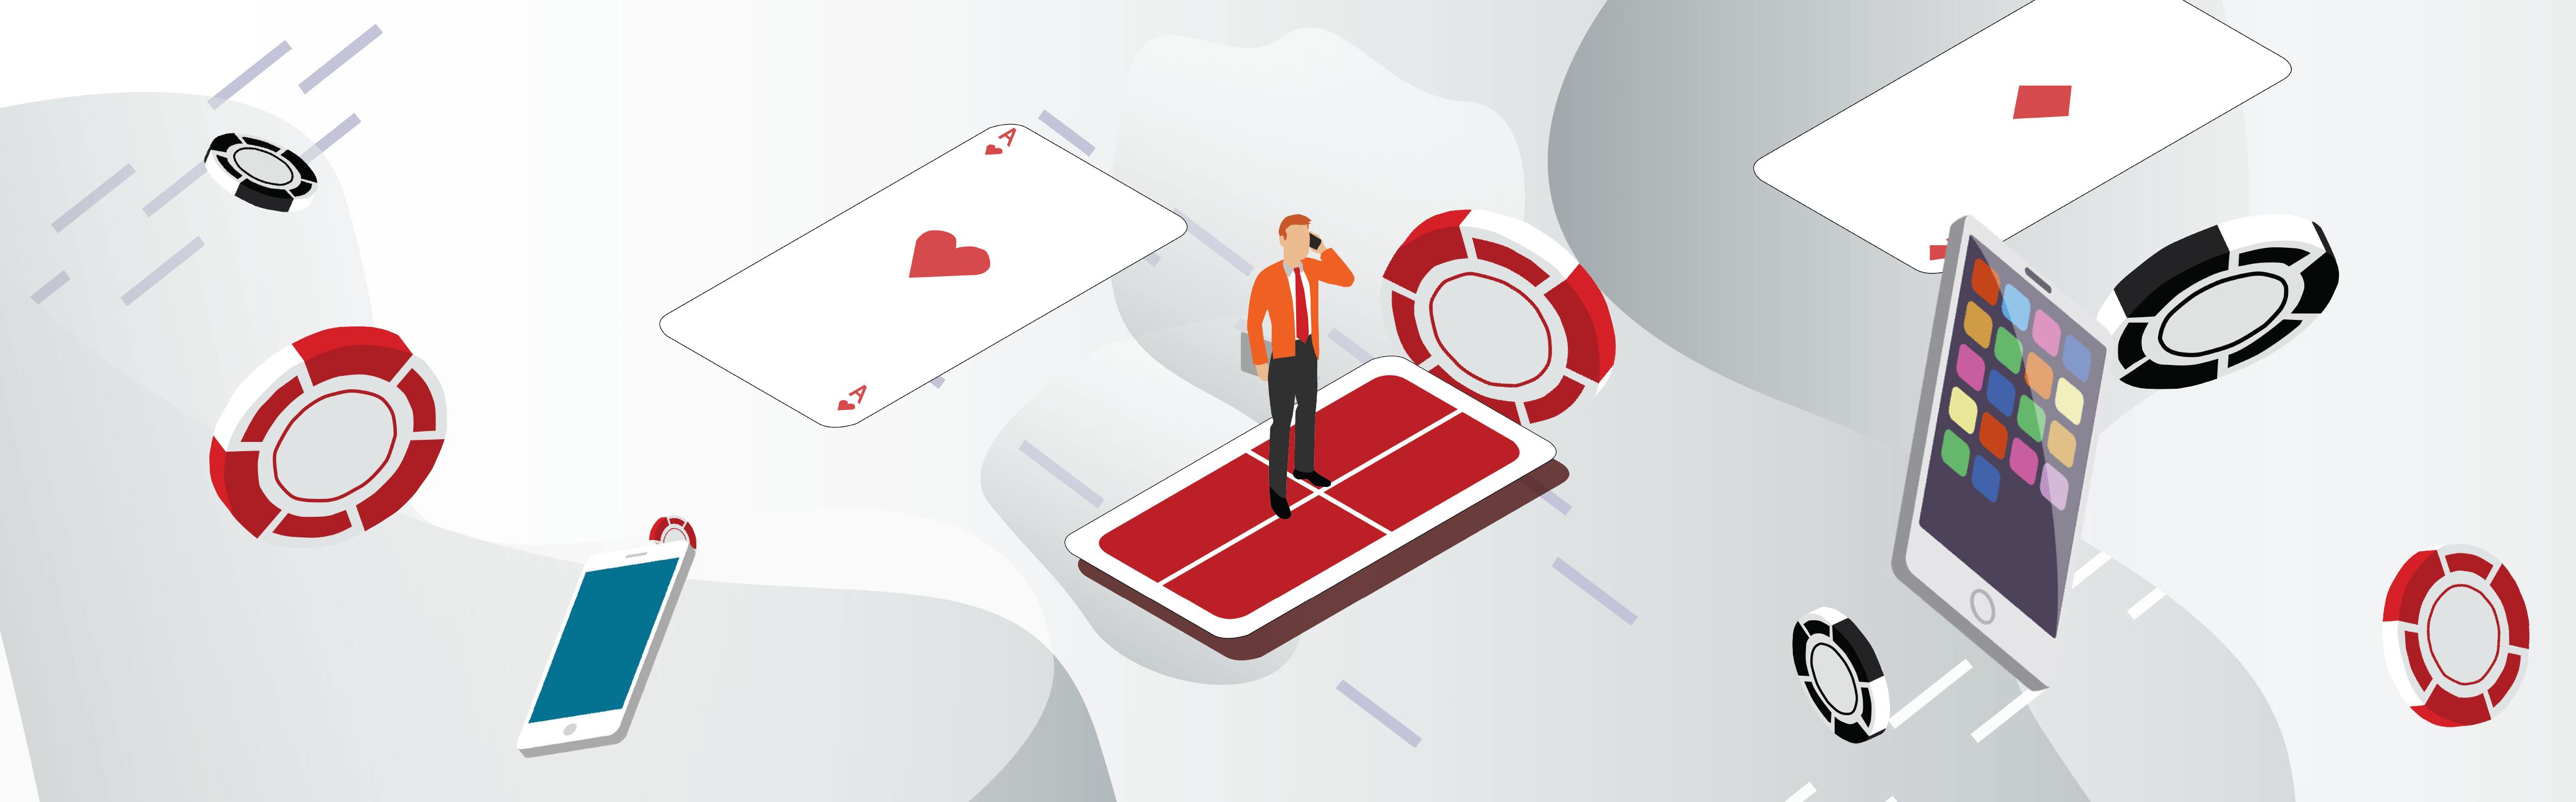 Online casino customer support agent